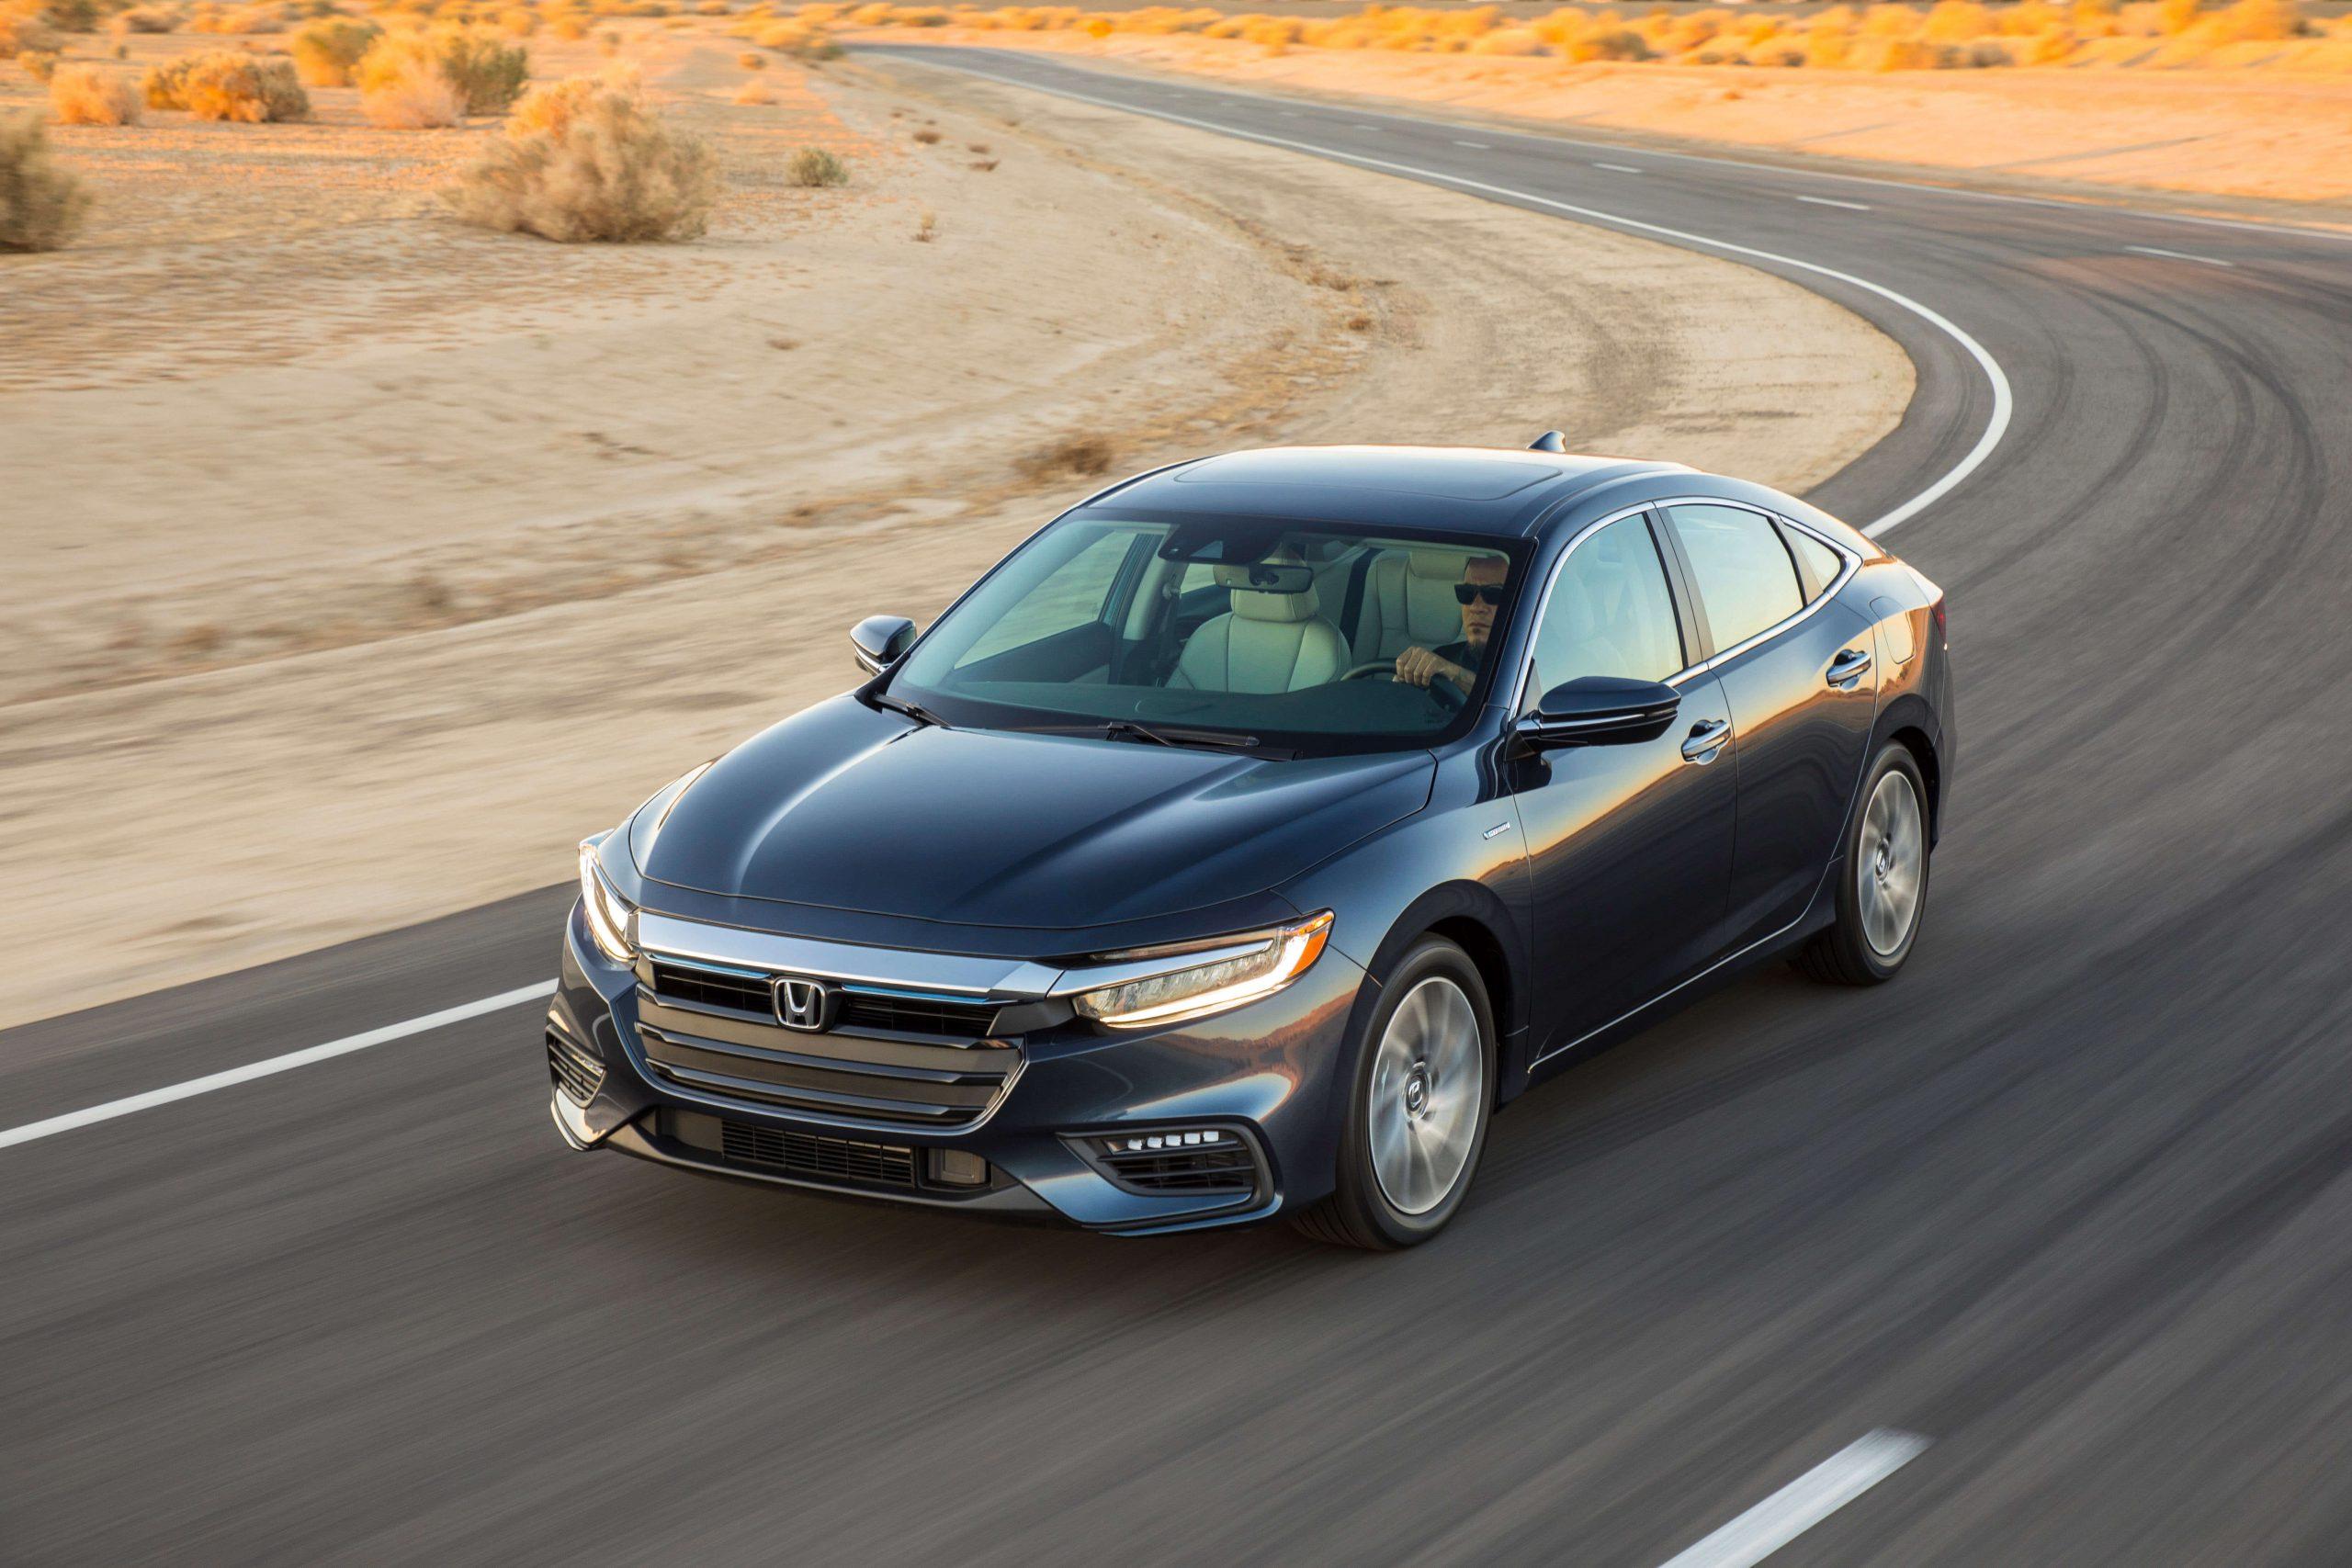 2021 Honda Insight Speed Test